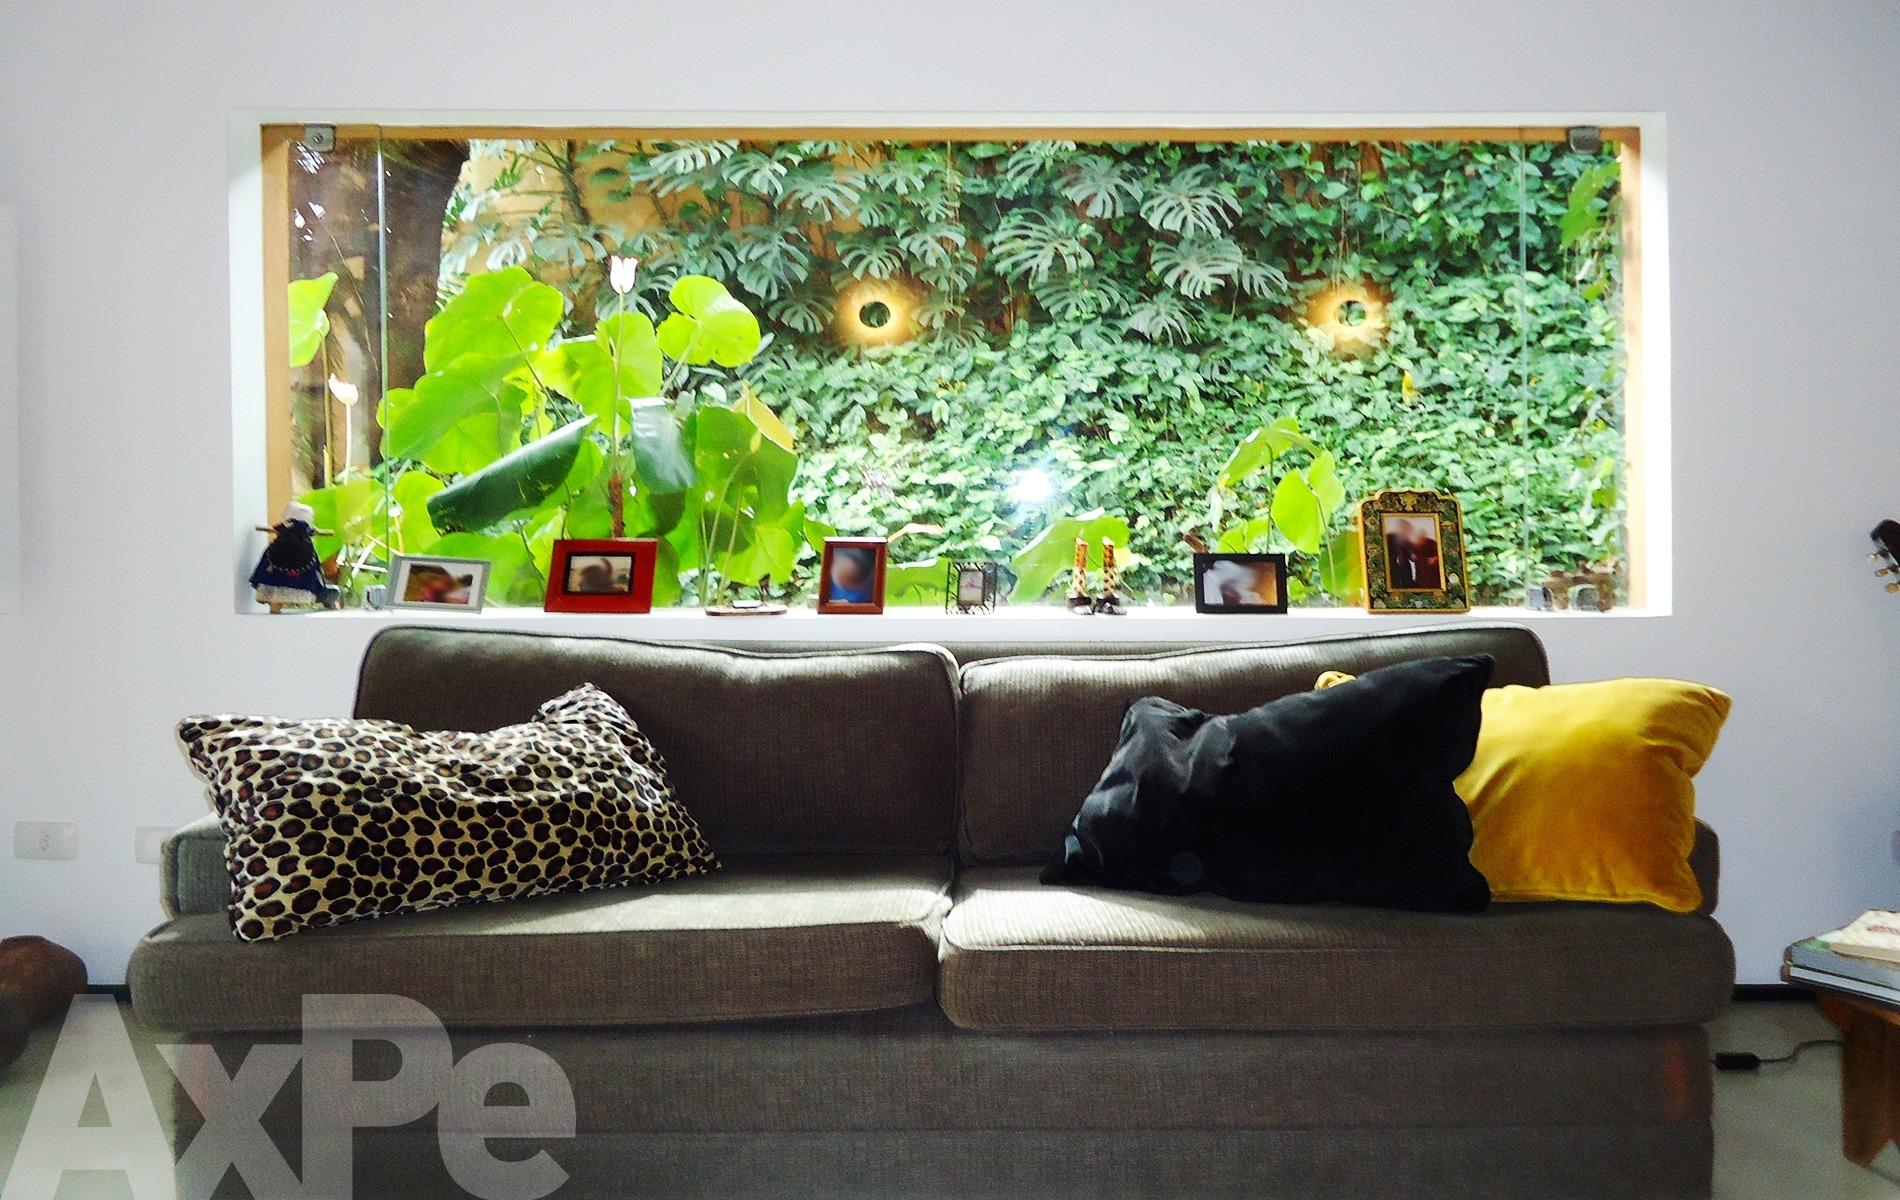 Axpe Casa - AX131070